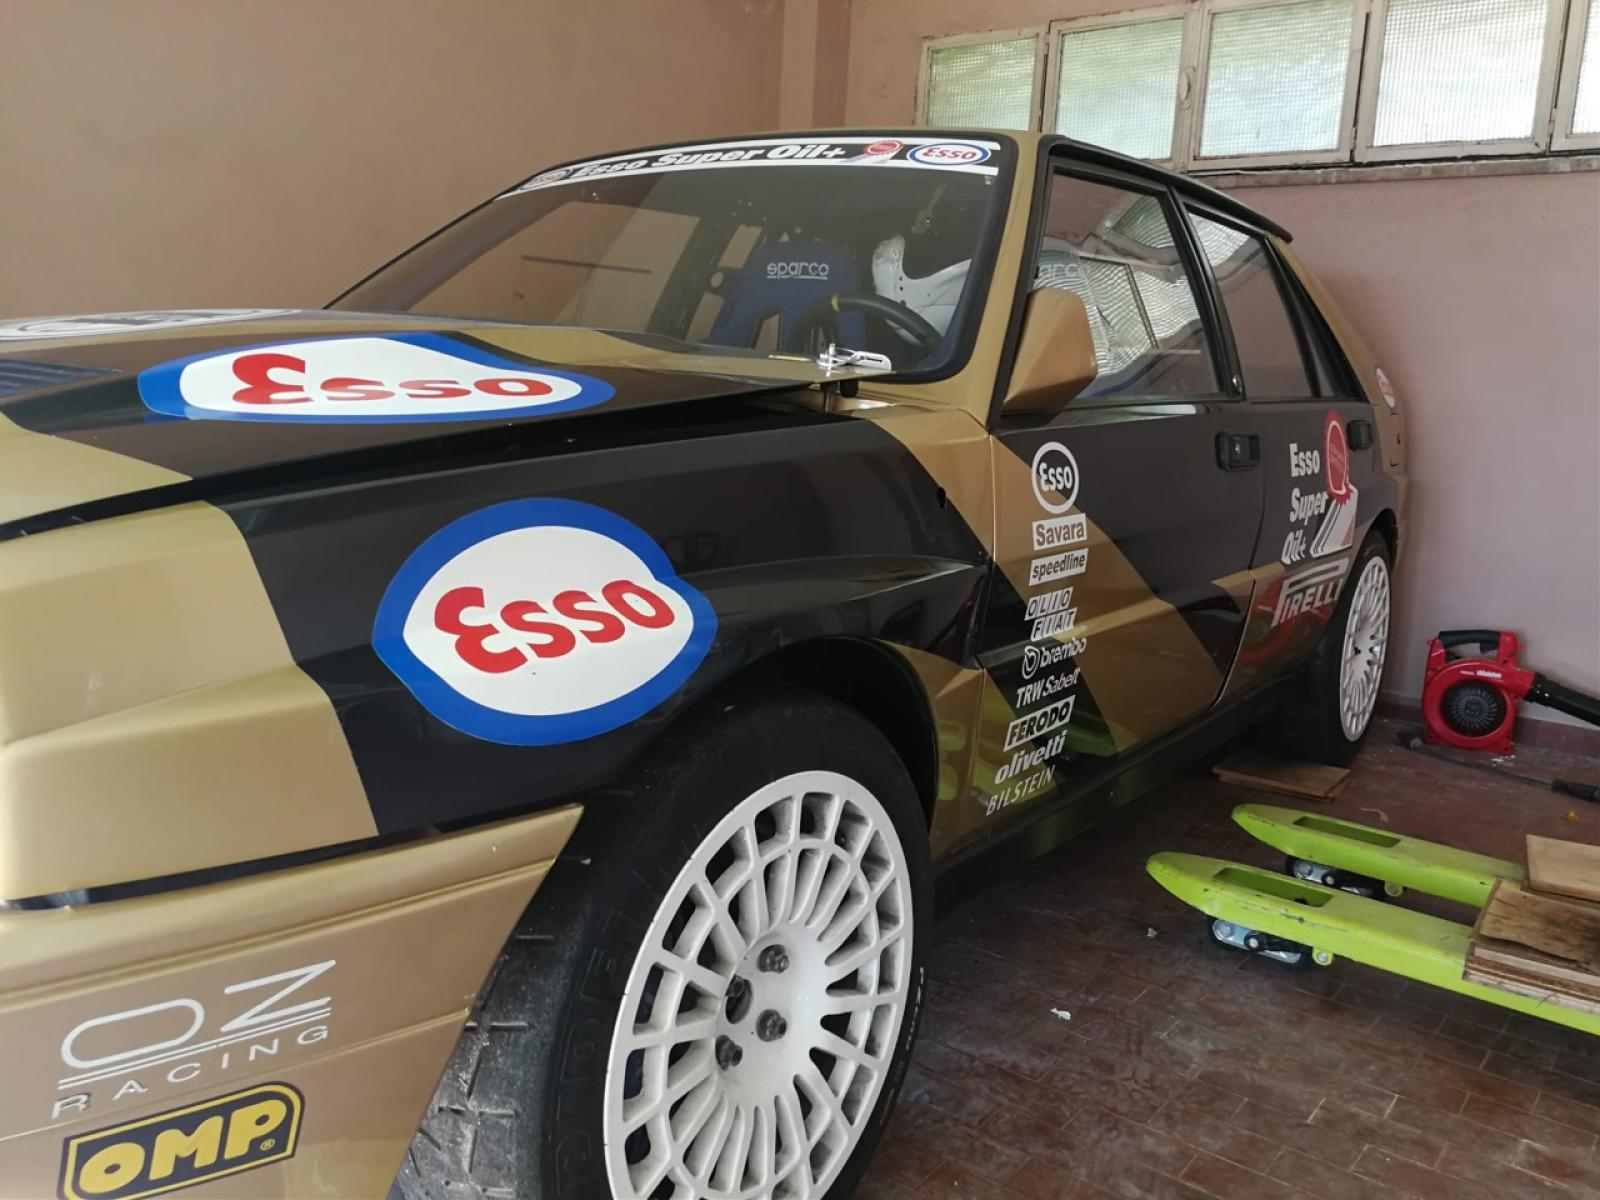 Lancia Delta Integrale 16v HF rally - 2